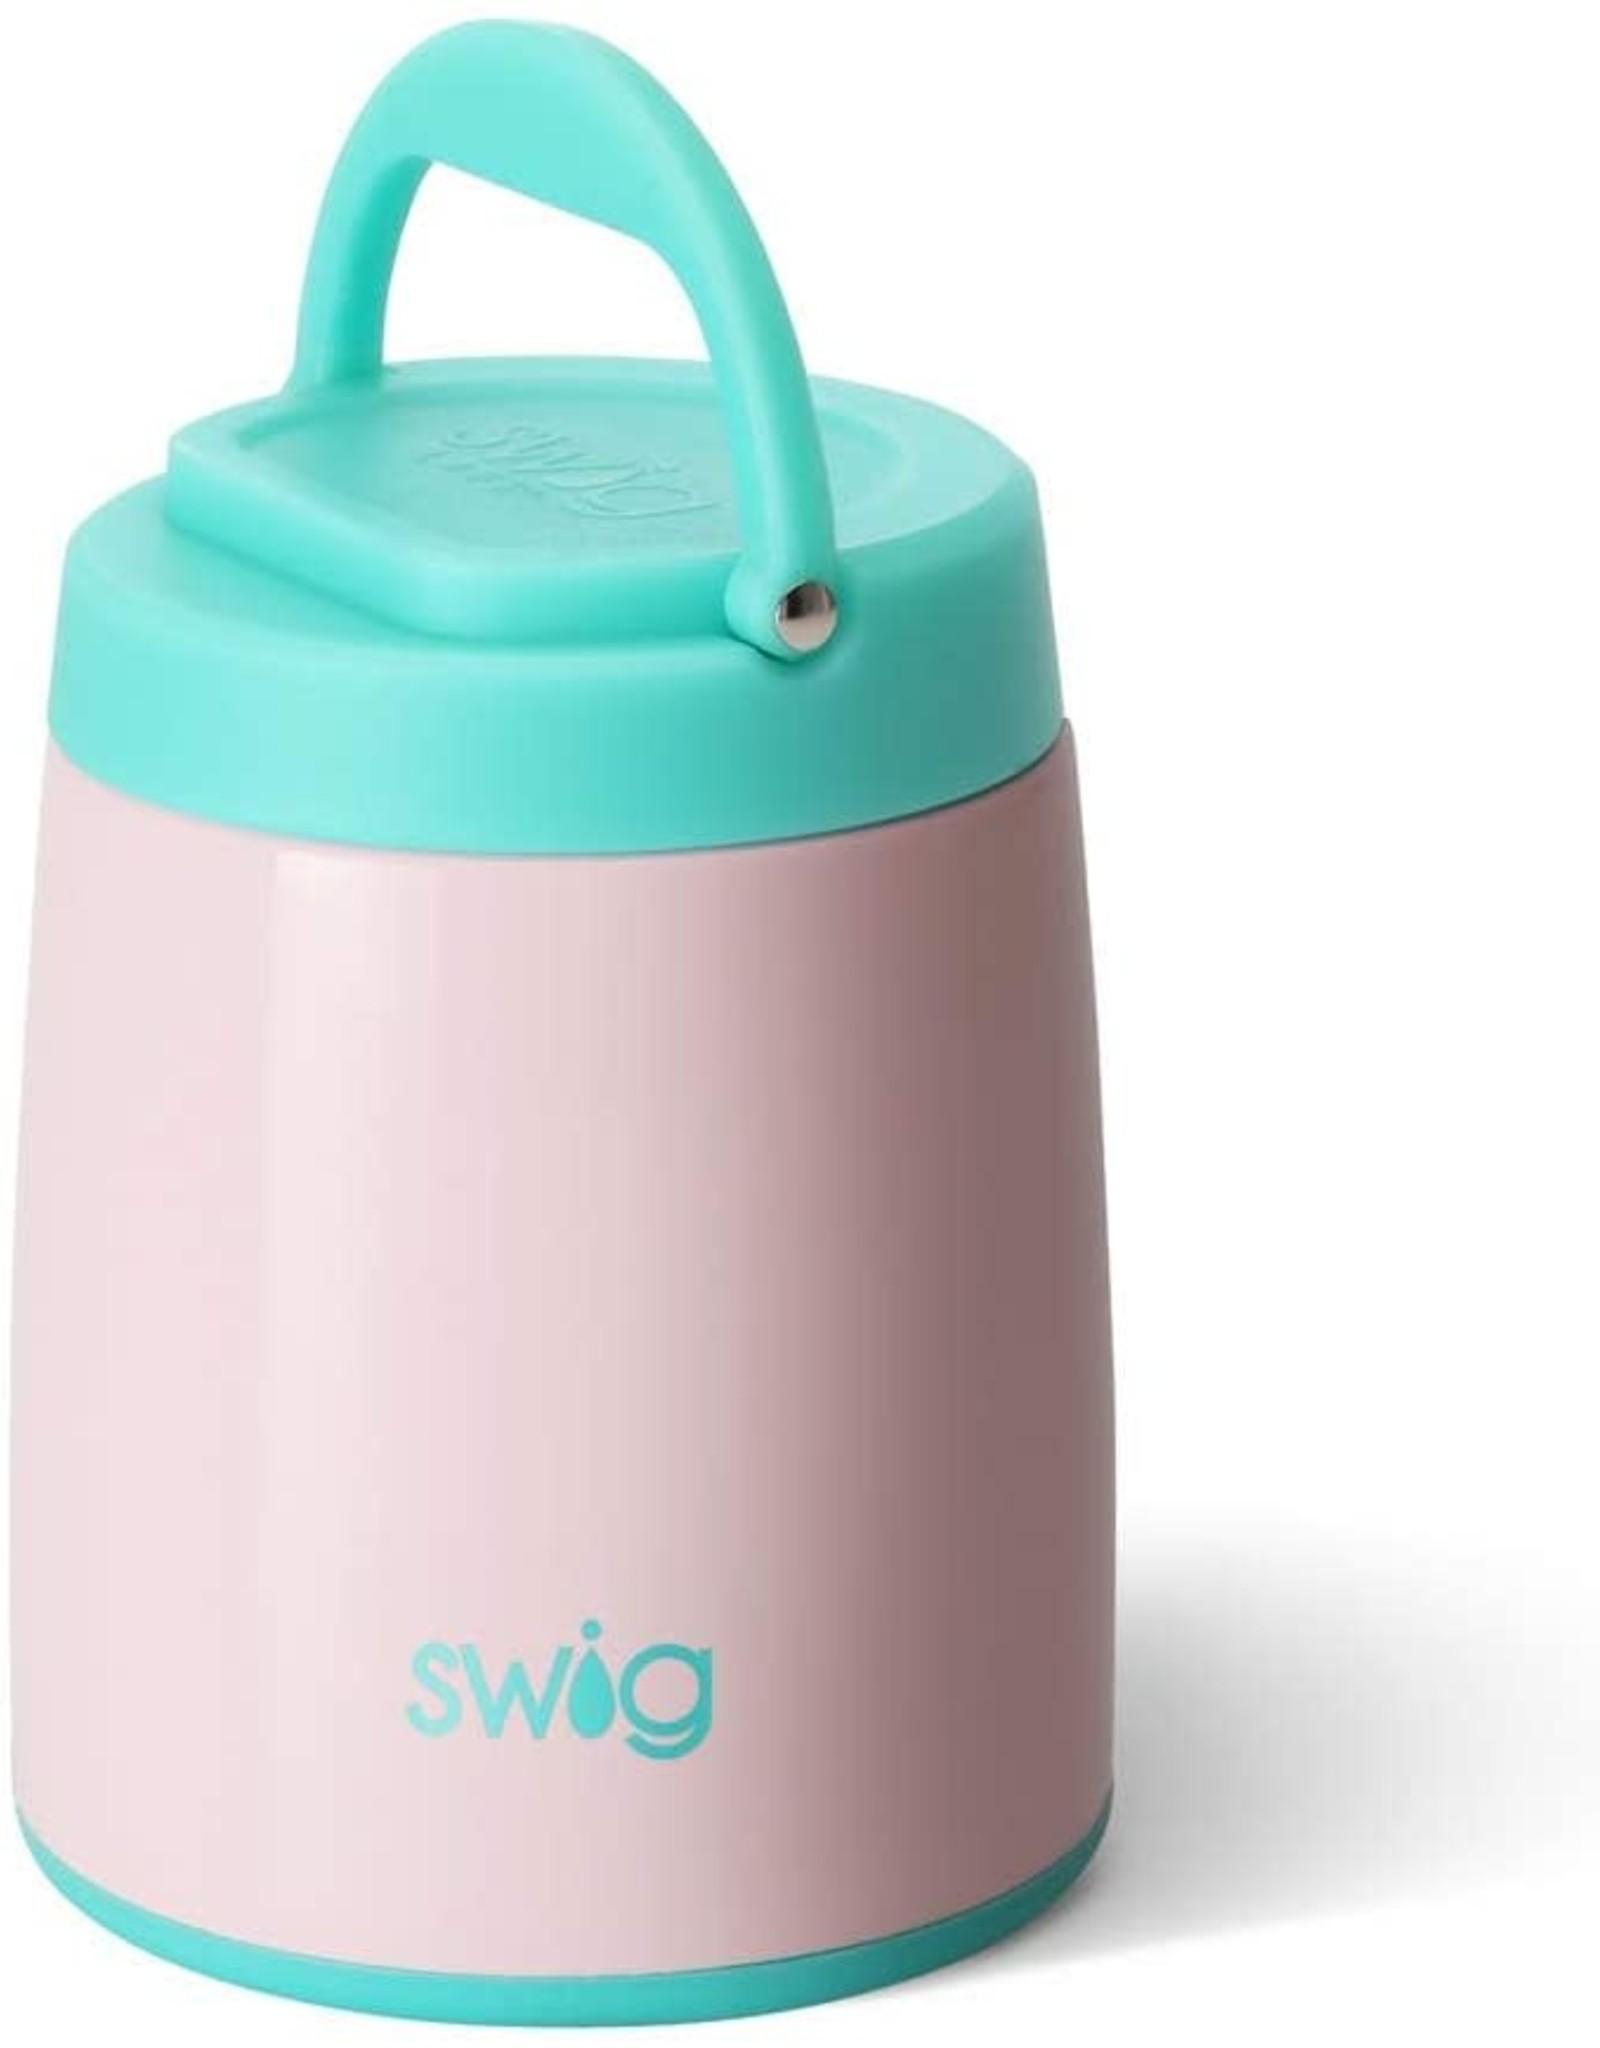 Swig Swig Drinkware Blush